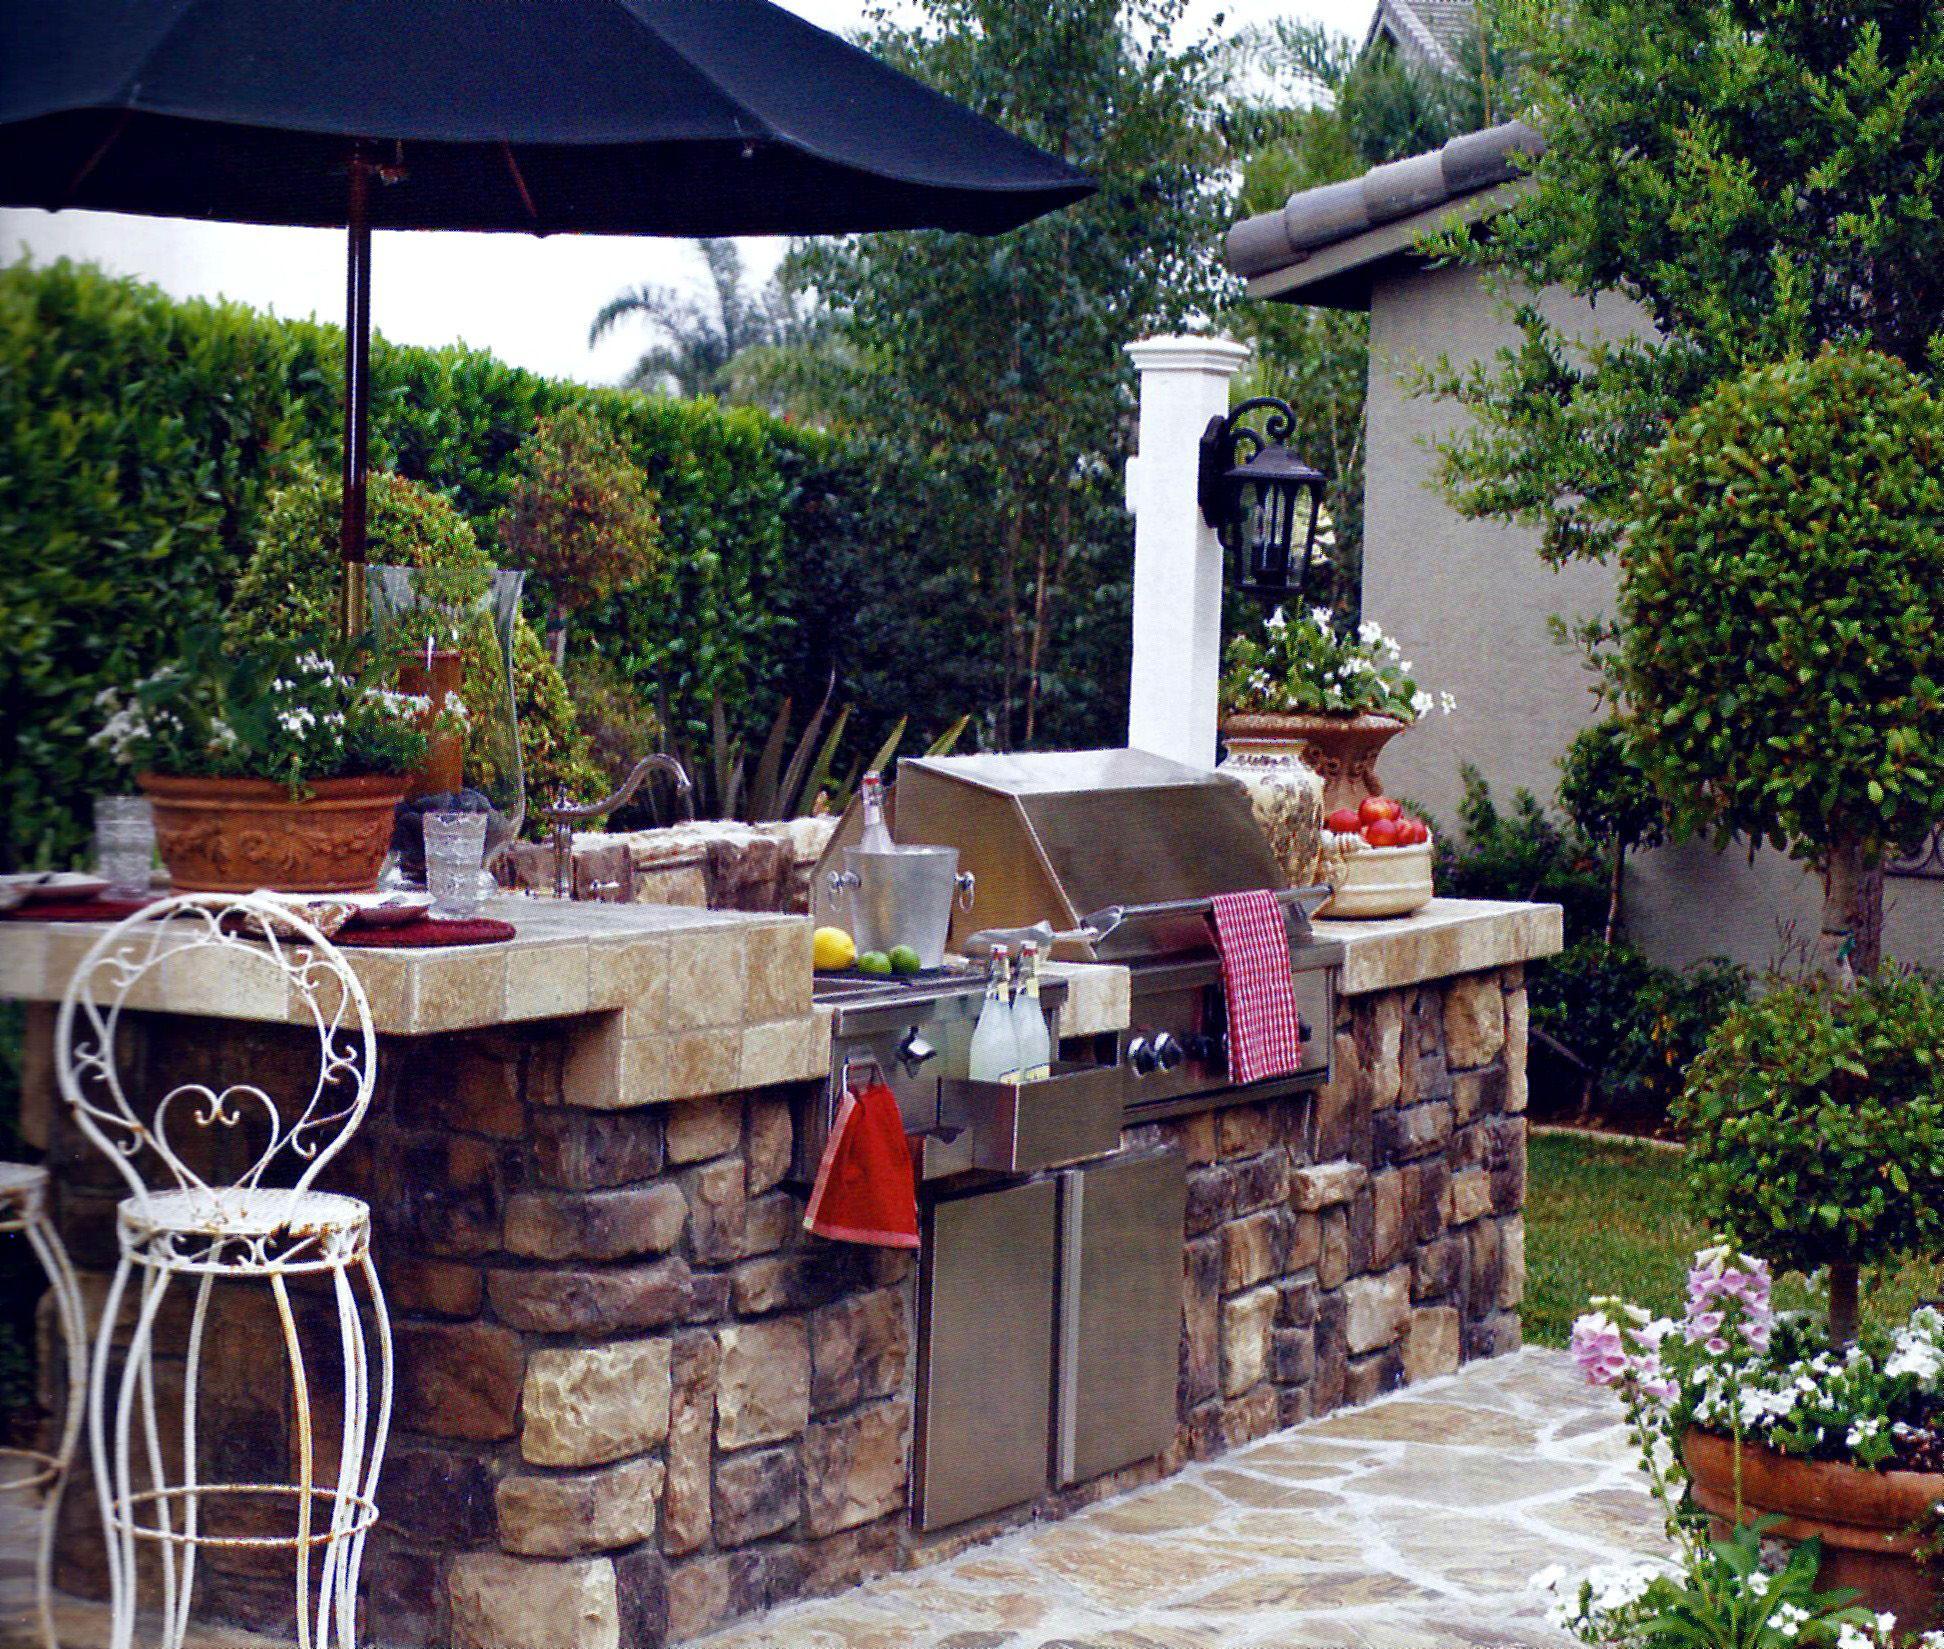 Outdoor barbeque island great backyard ideas pinterest for Outdoor barbecue island ideas